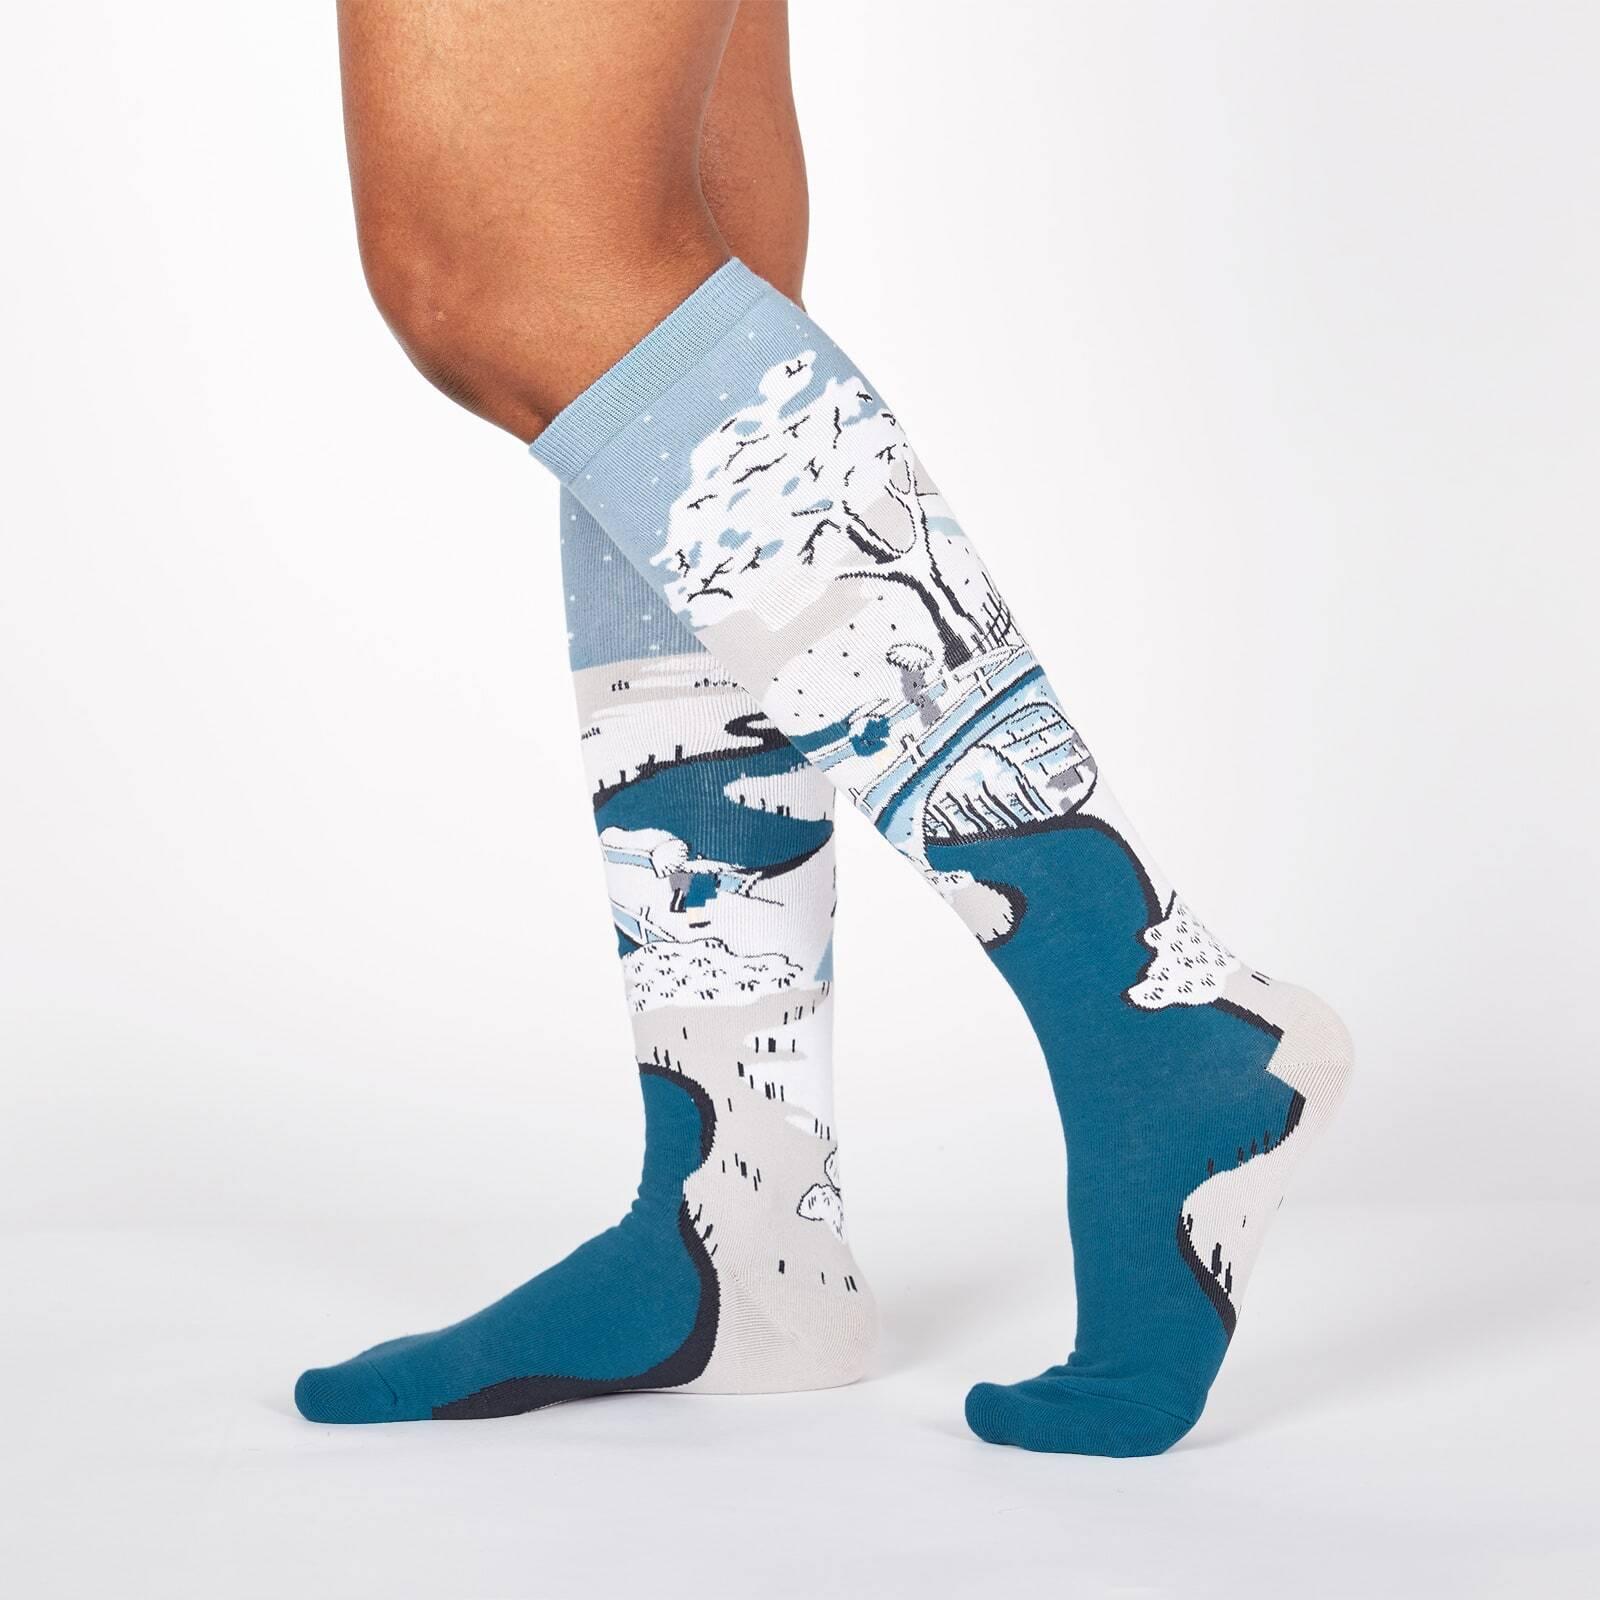 model wearing Meguro Drum Bridge - Utagawa Hiroshige (Ando) Painting Knee High Socks Blue - Women's